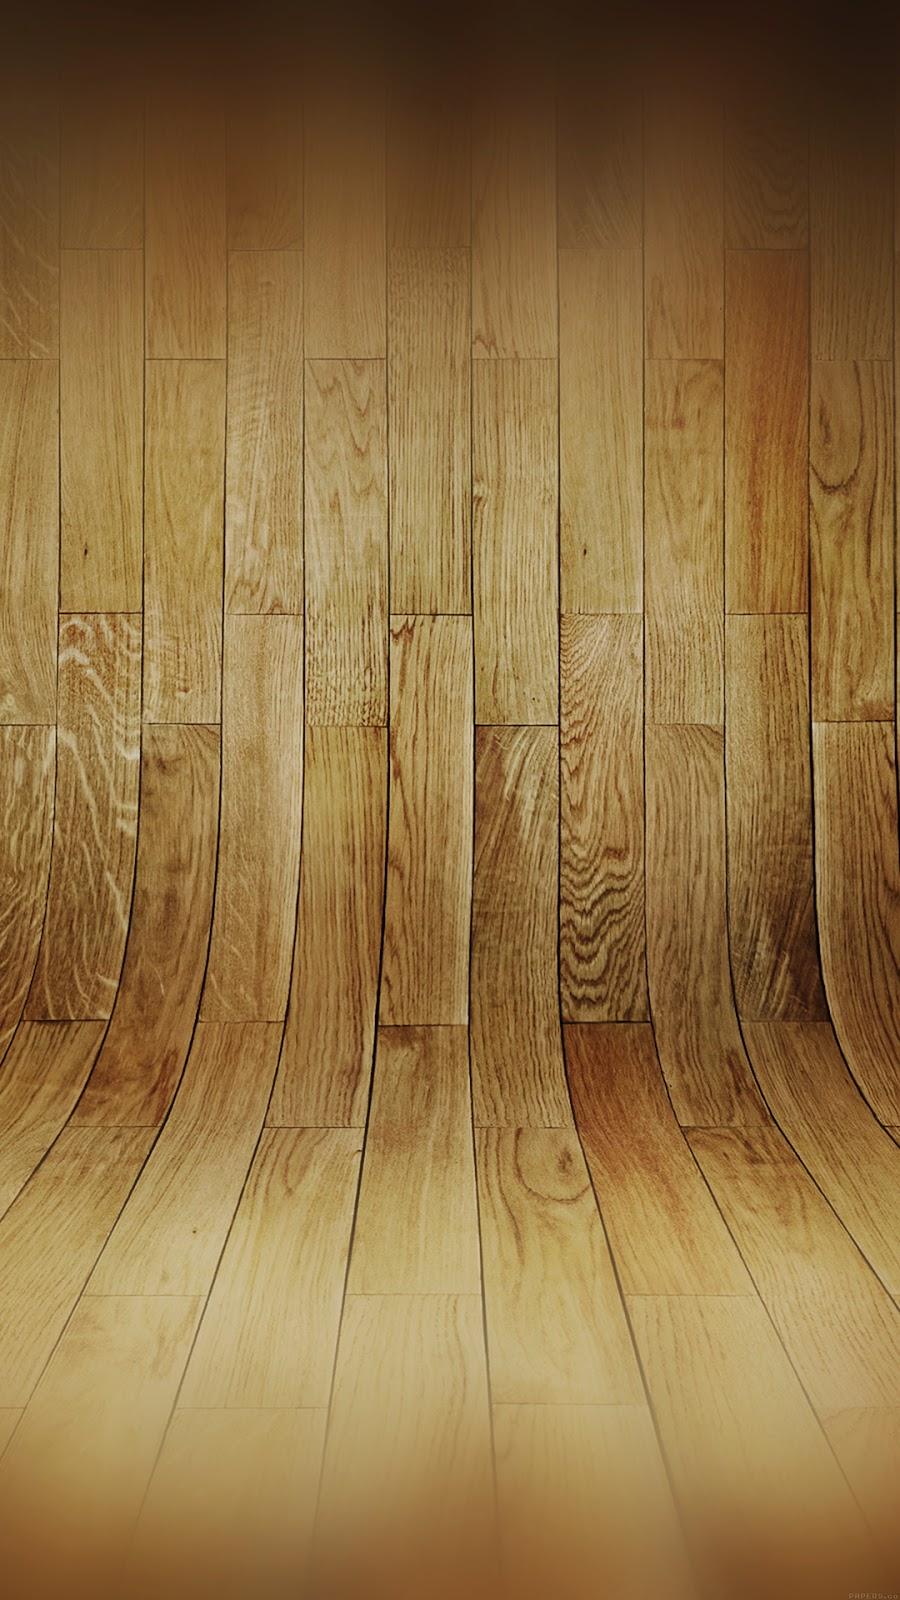 Wood D Iphone